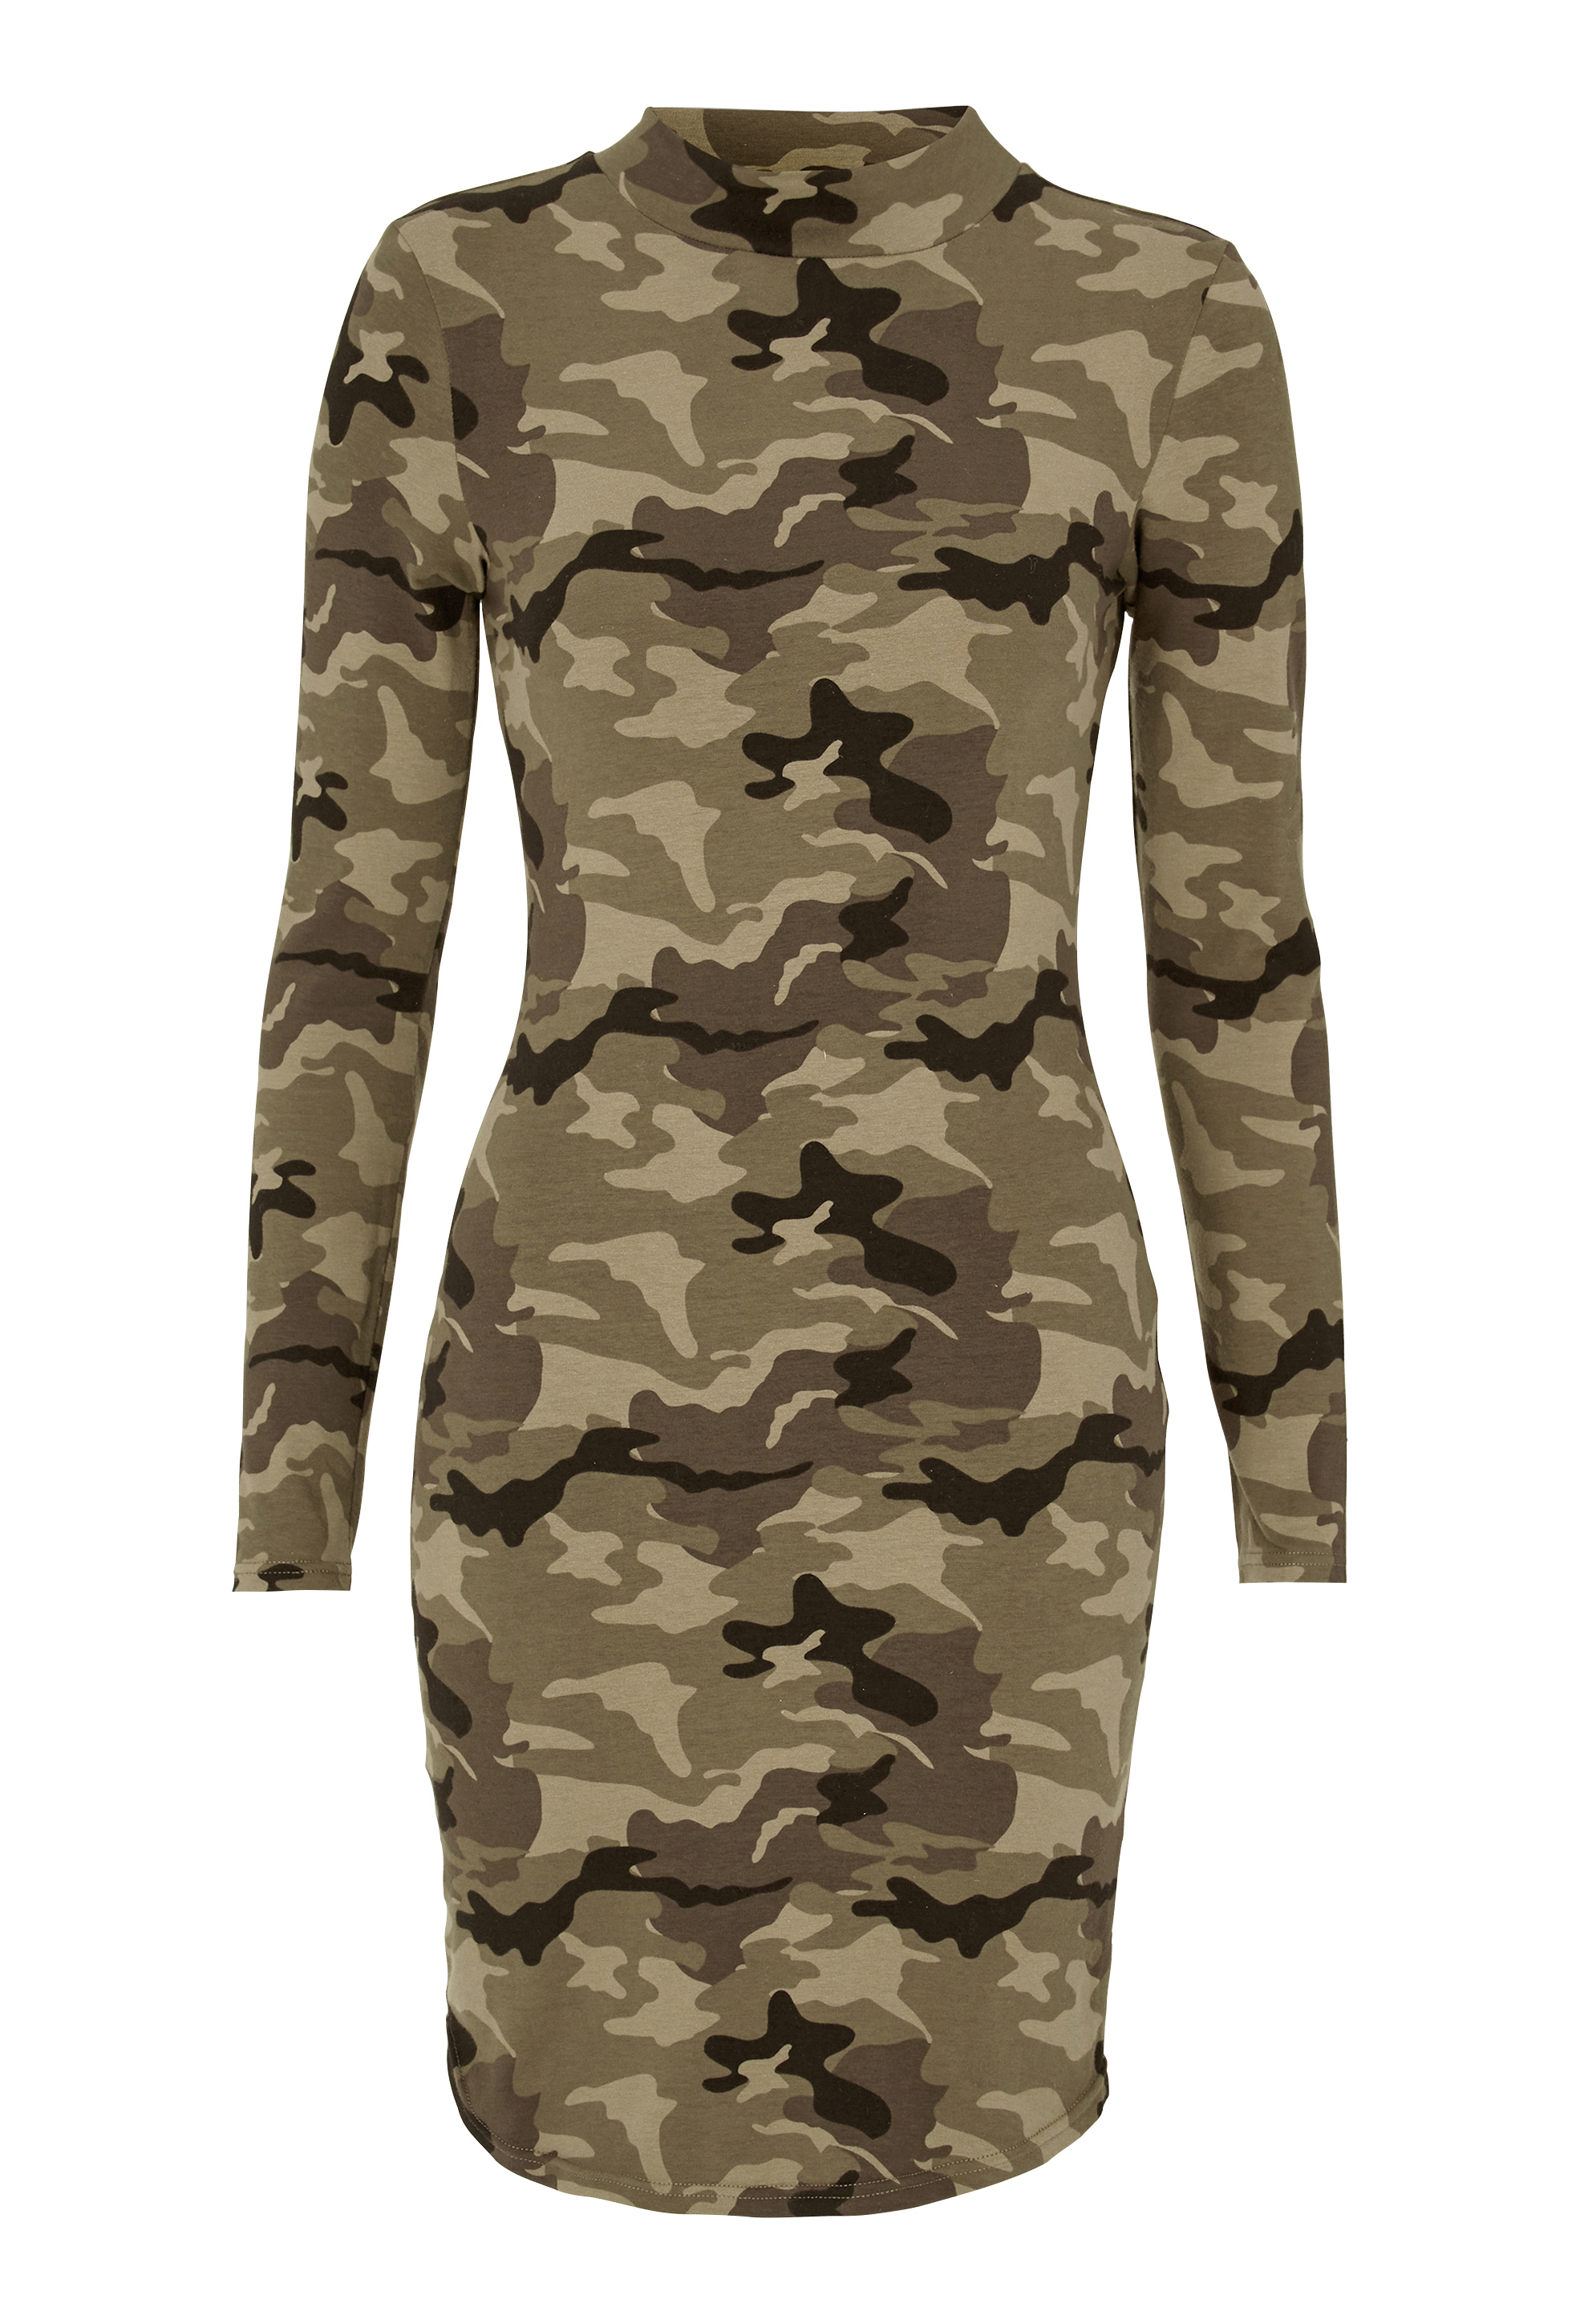 77thFLEA Brenna Camo Dress Camouflage Bubbleroom